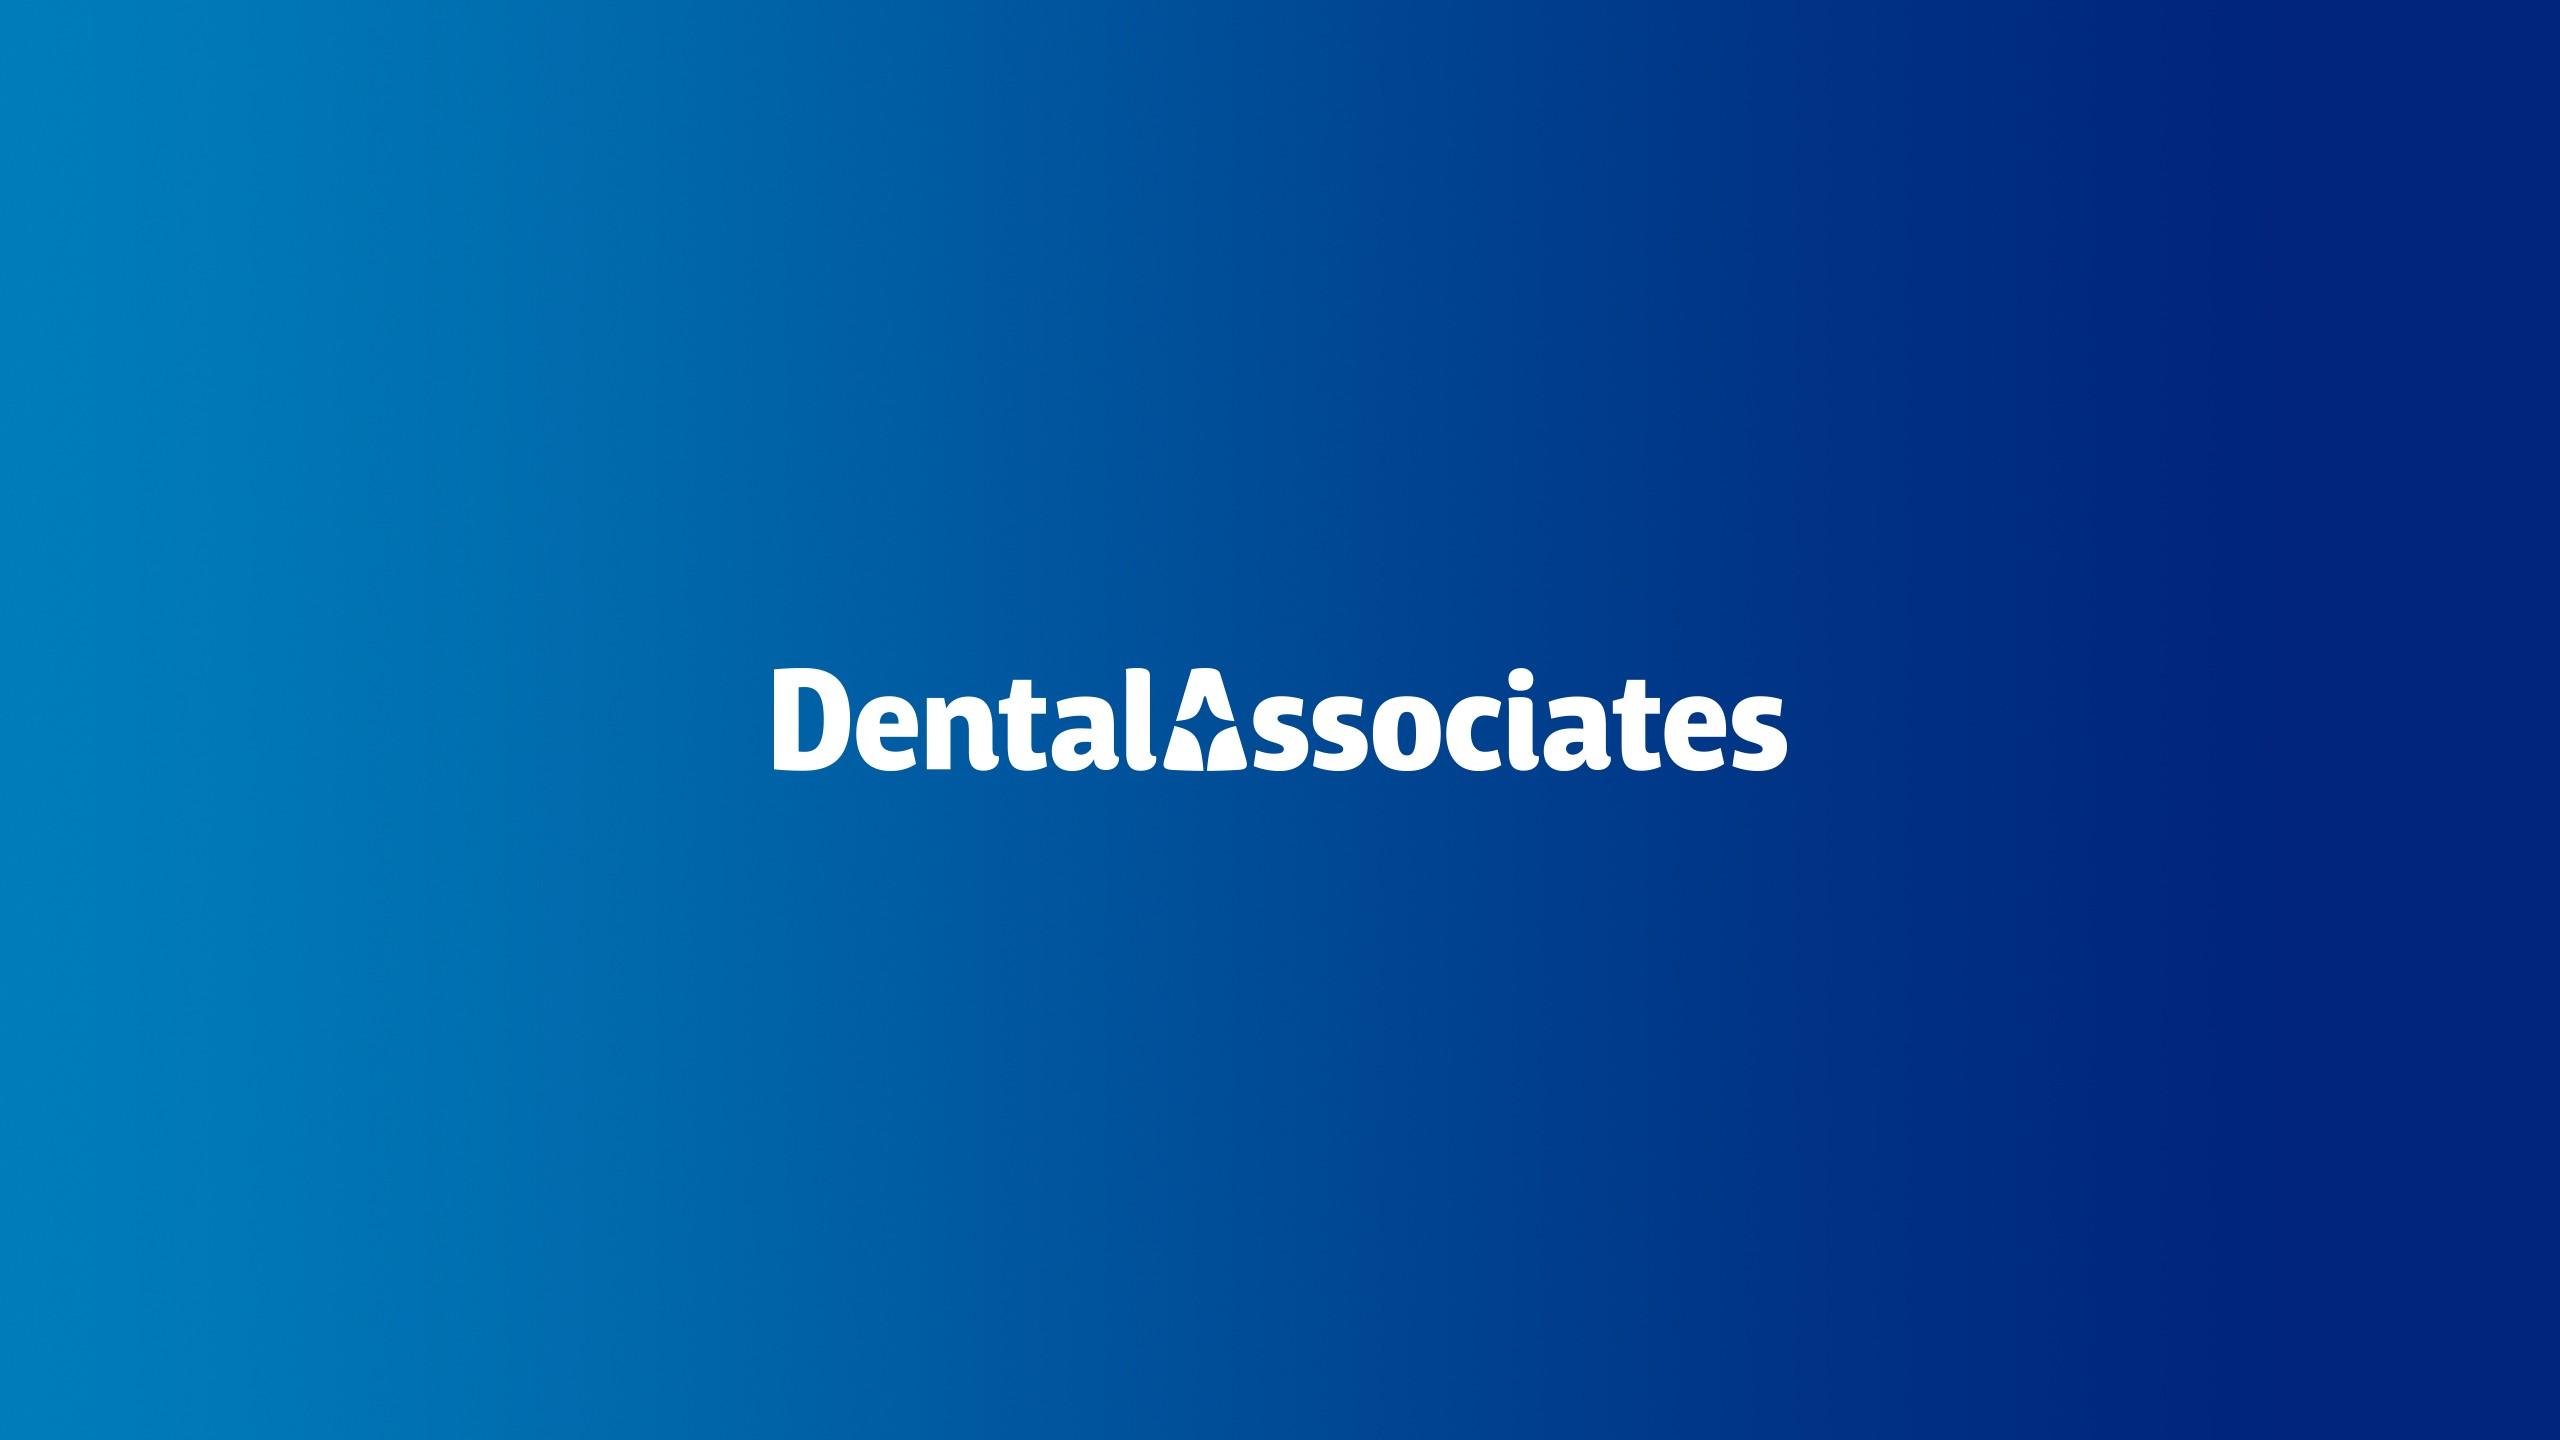 Dental Associates   LinkedIn